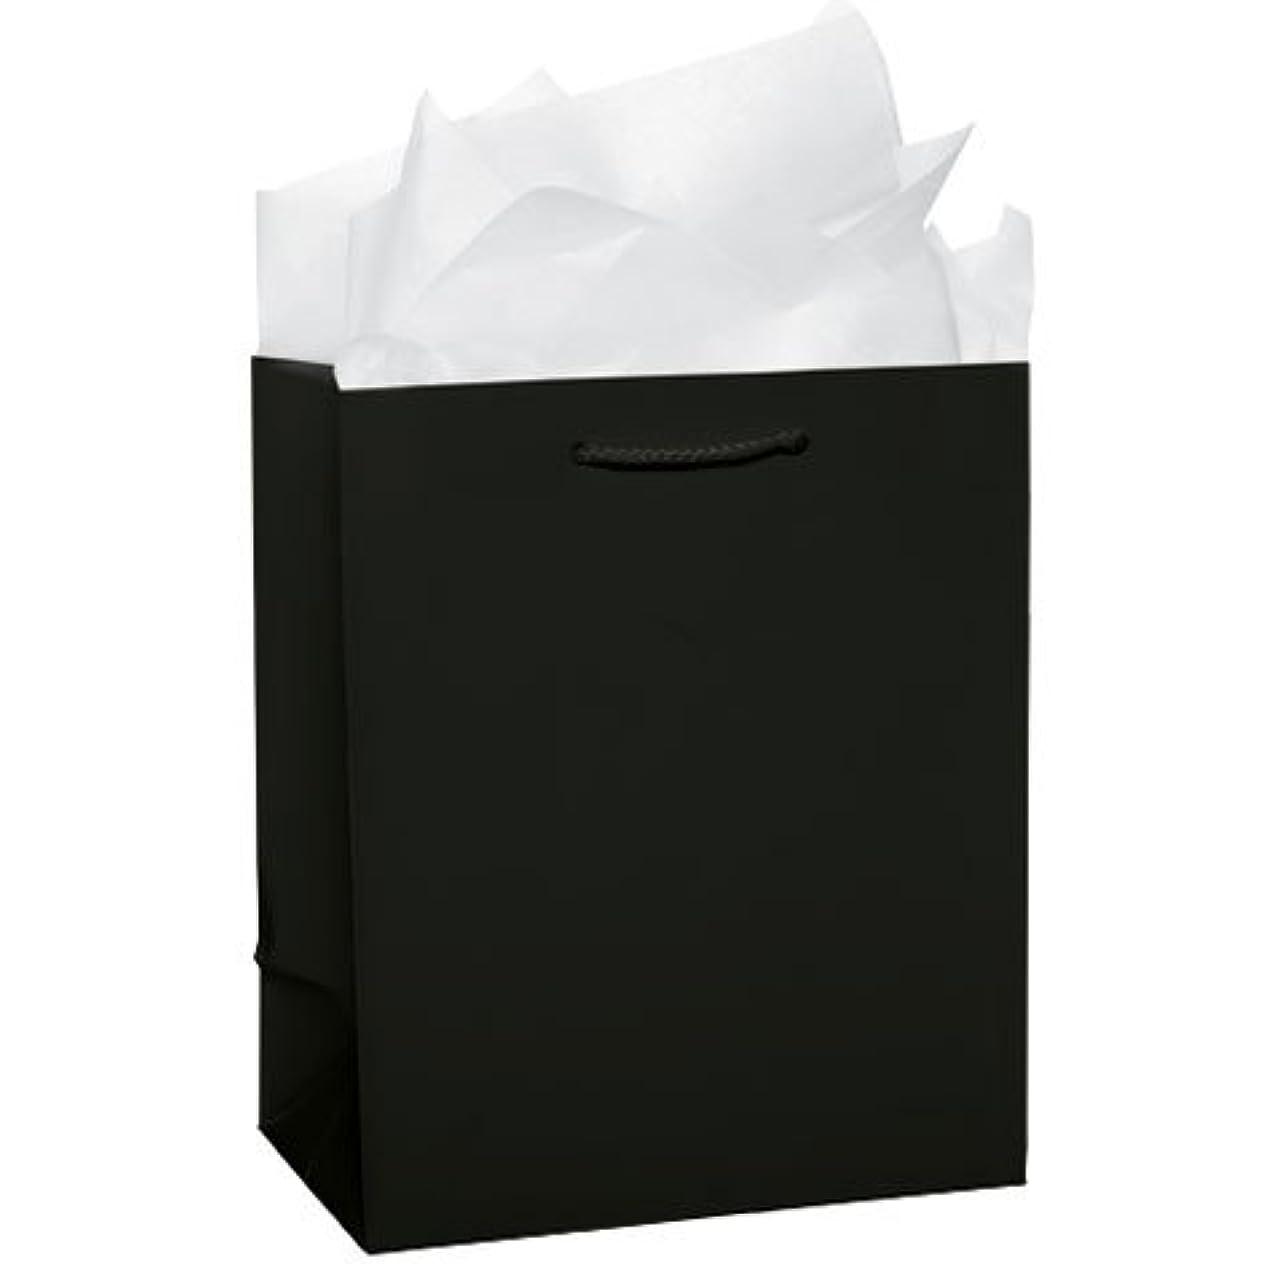 Black Solid Glossy Bag Medium Value Pack | 12 Ct